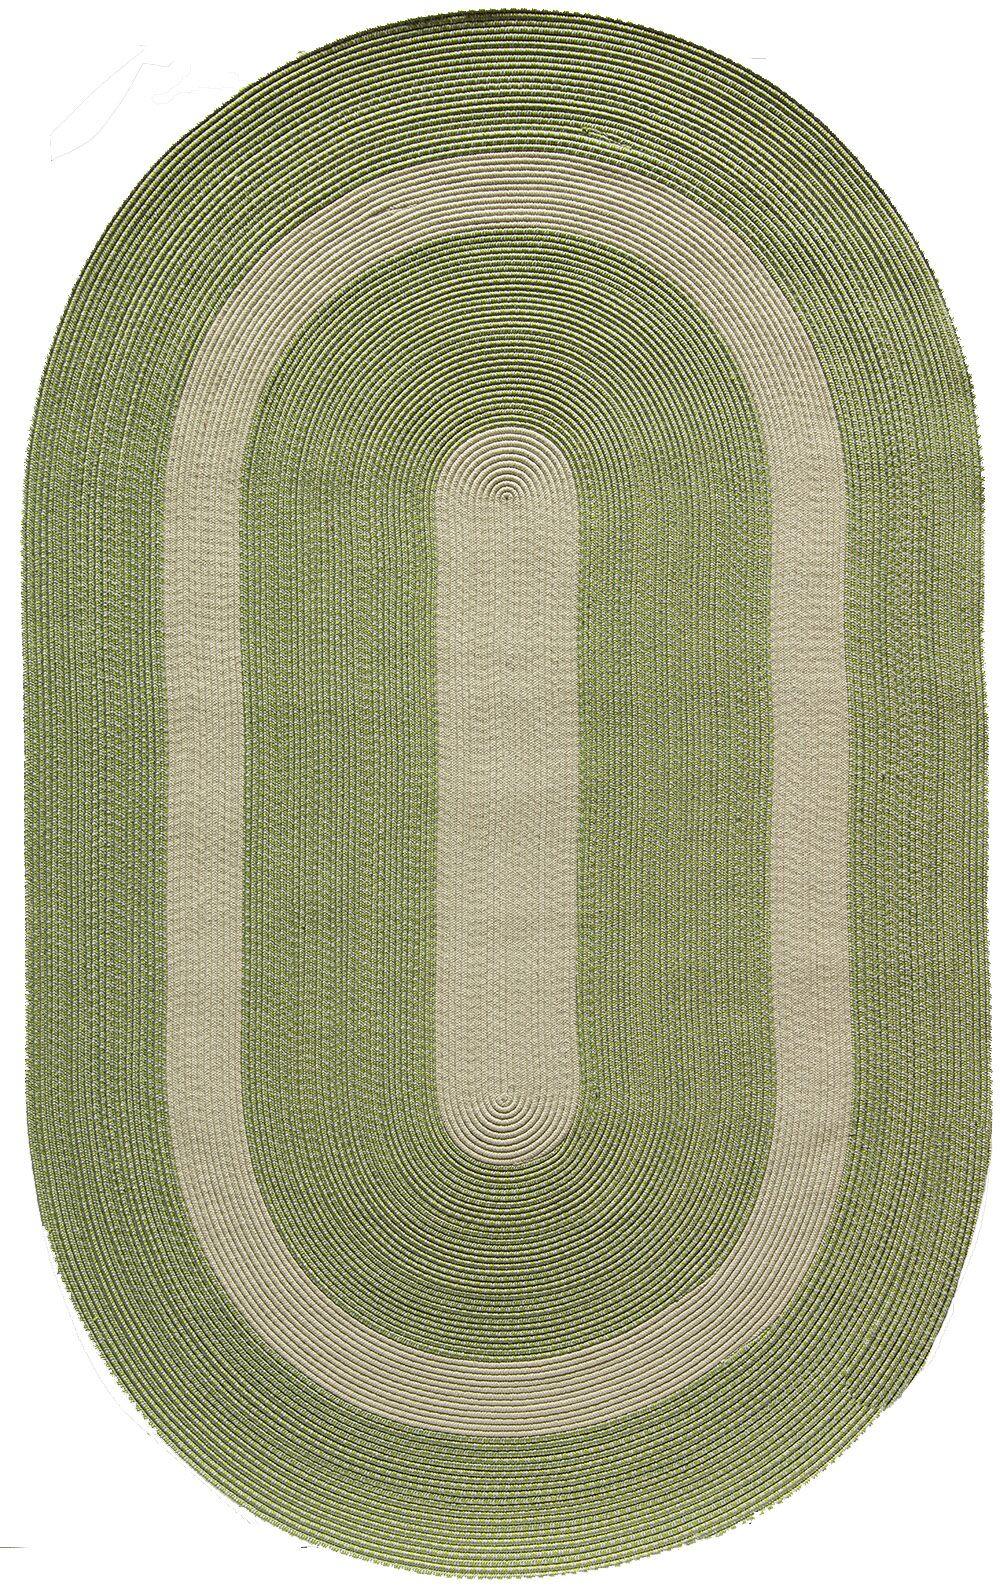 Heritage Mint GreenArea Rug  Rug Size: Oval 5' x 8'